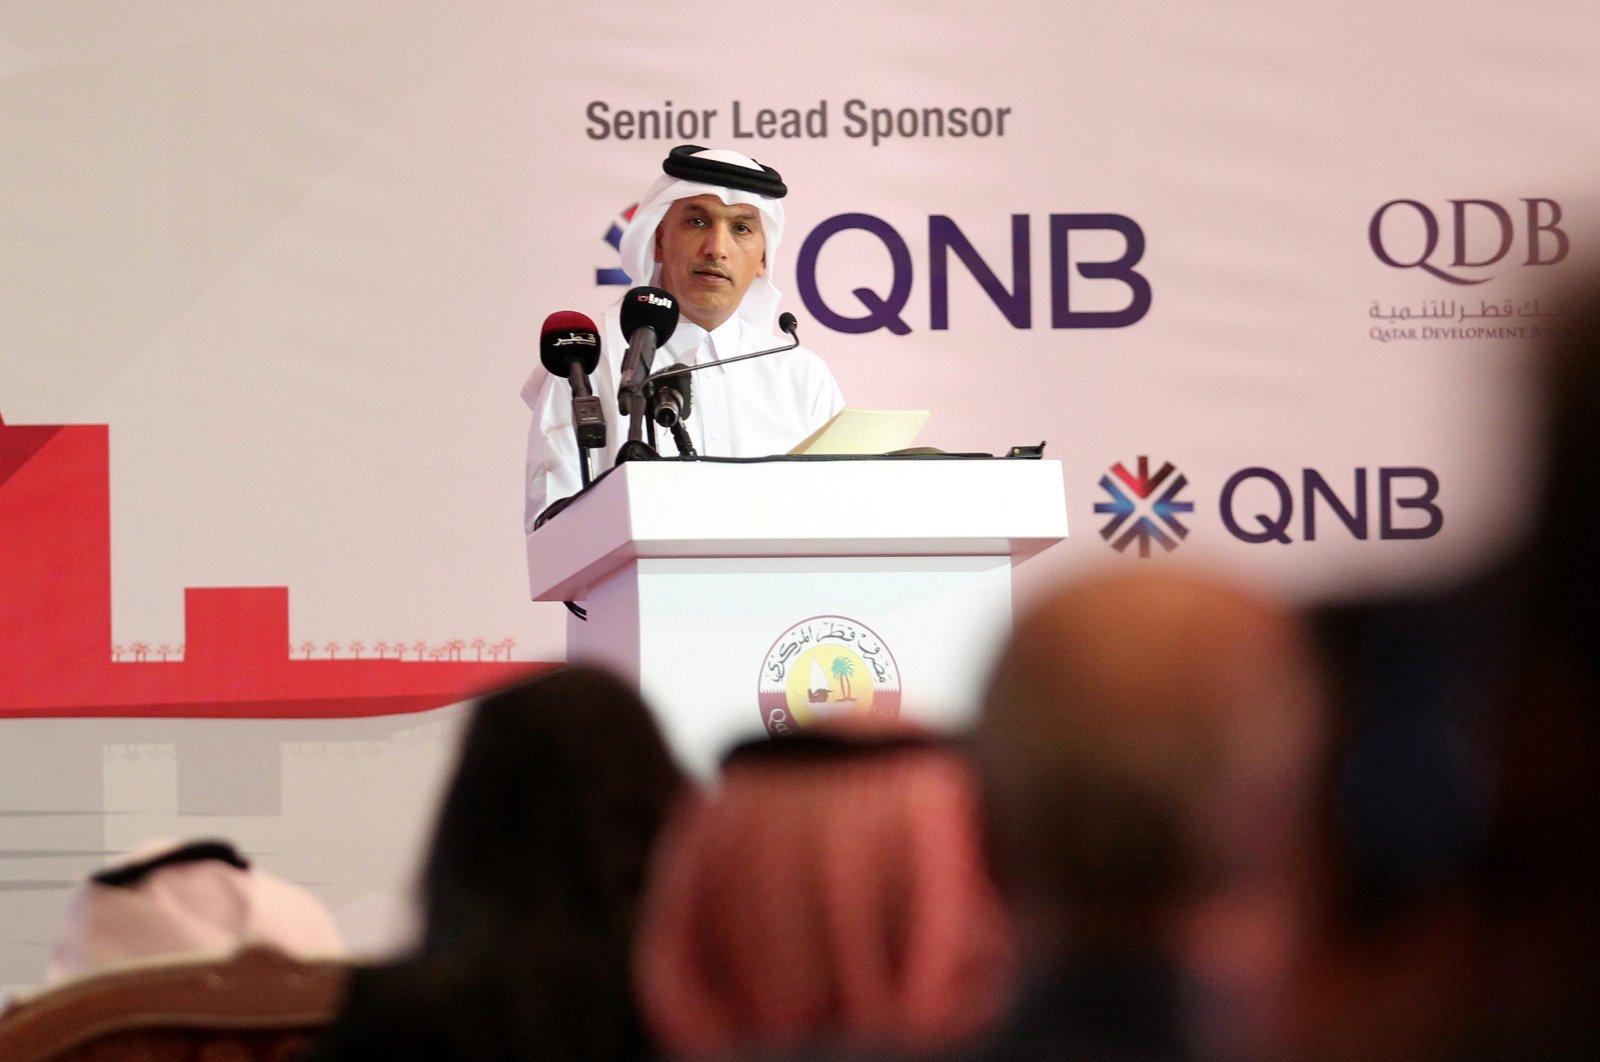 Qatar Finance Minister Ali Sherif al-Emadi speaks during the Euromoney Qatar Conference in Doha, Qatar, Dec. 6, 2016. (Reuters Photo)